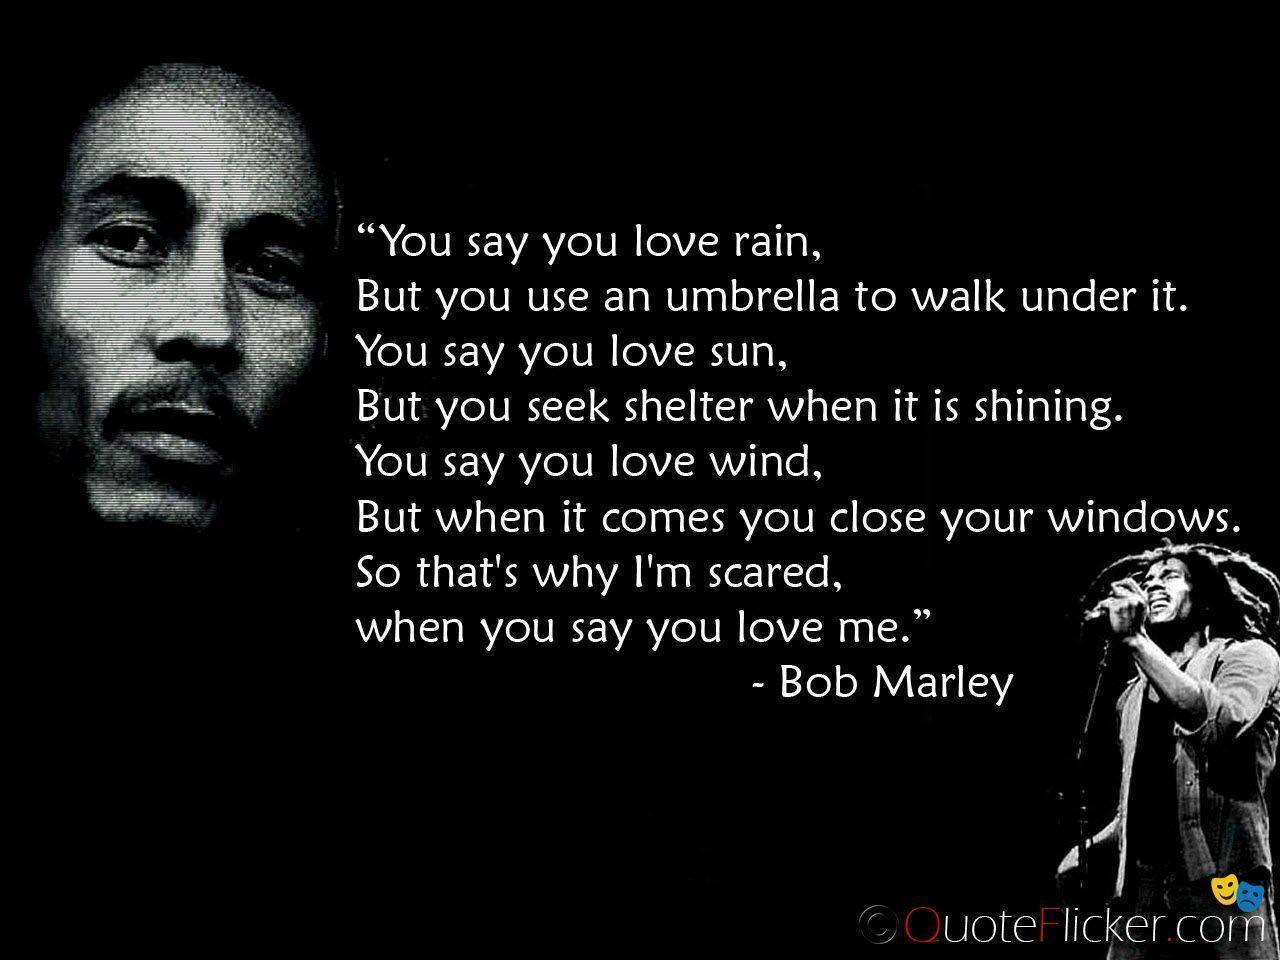 Bob Marley Quotes Wallpapers  Wallpaper Cave